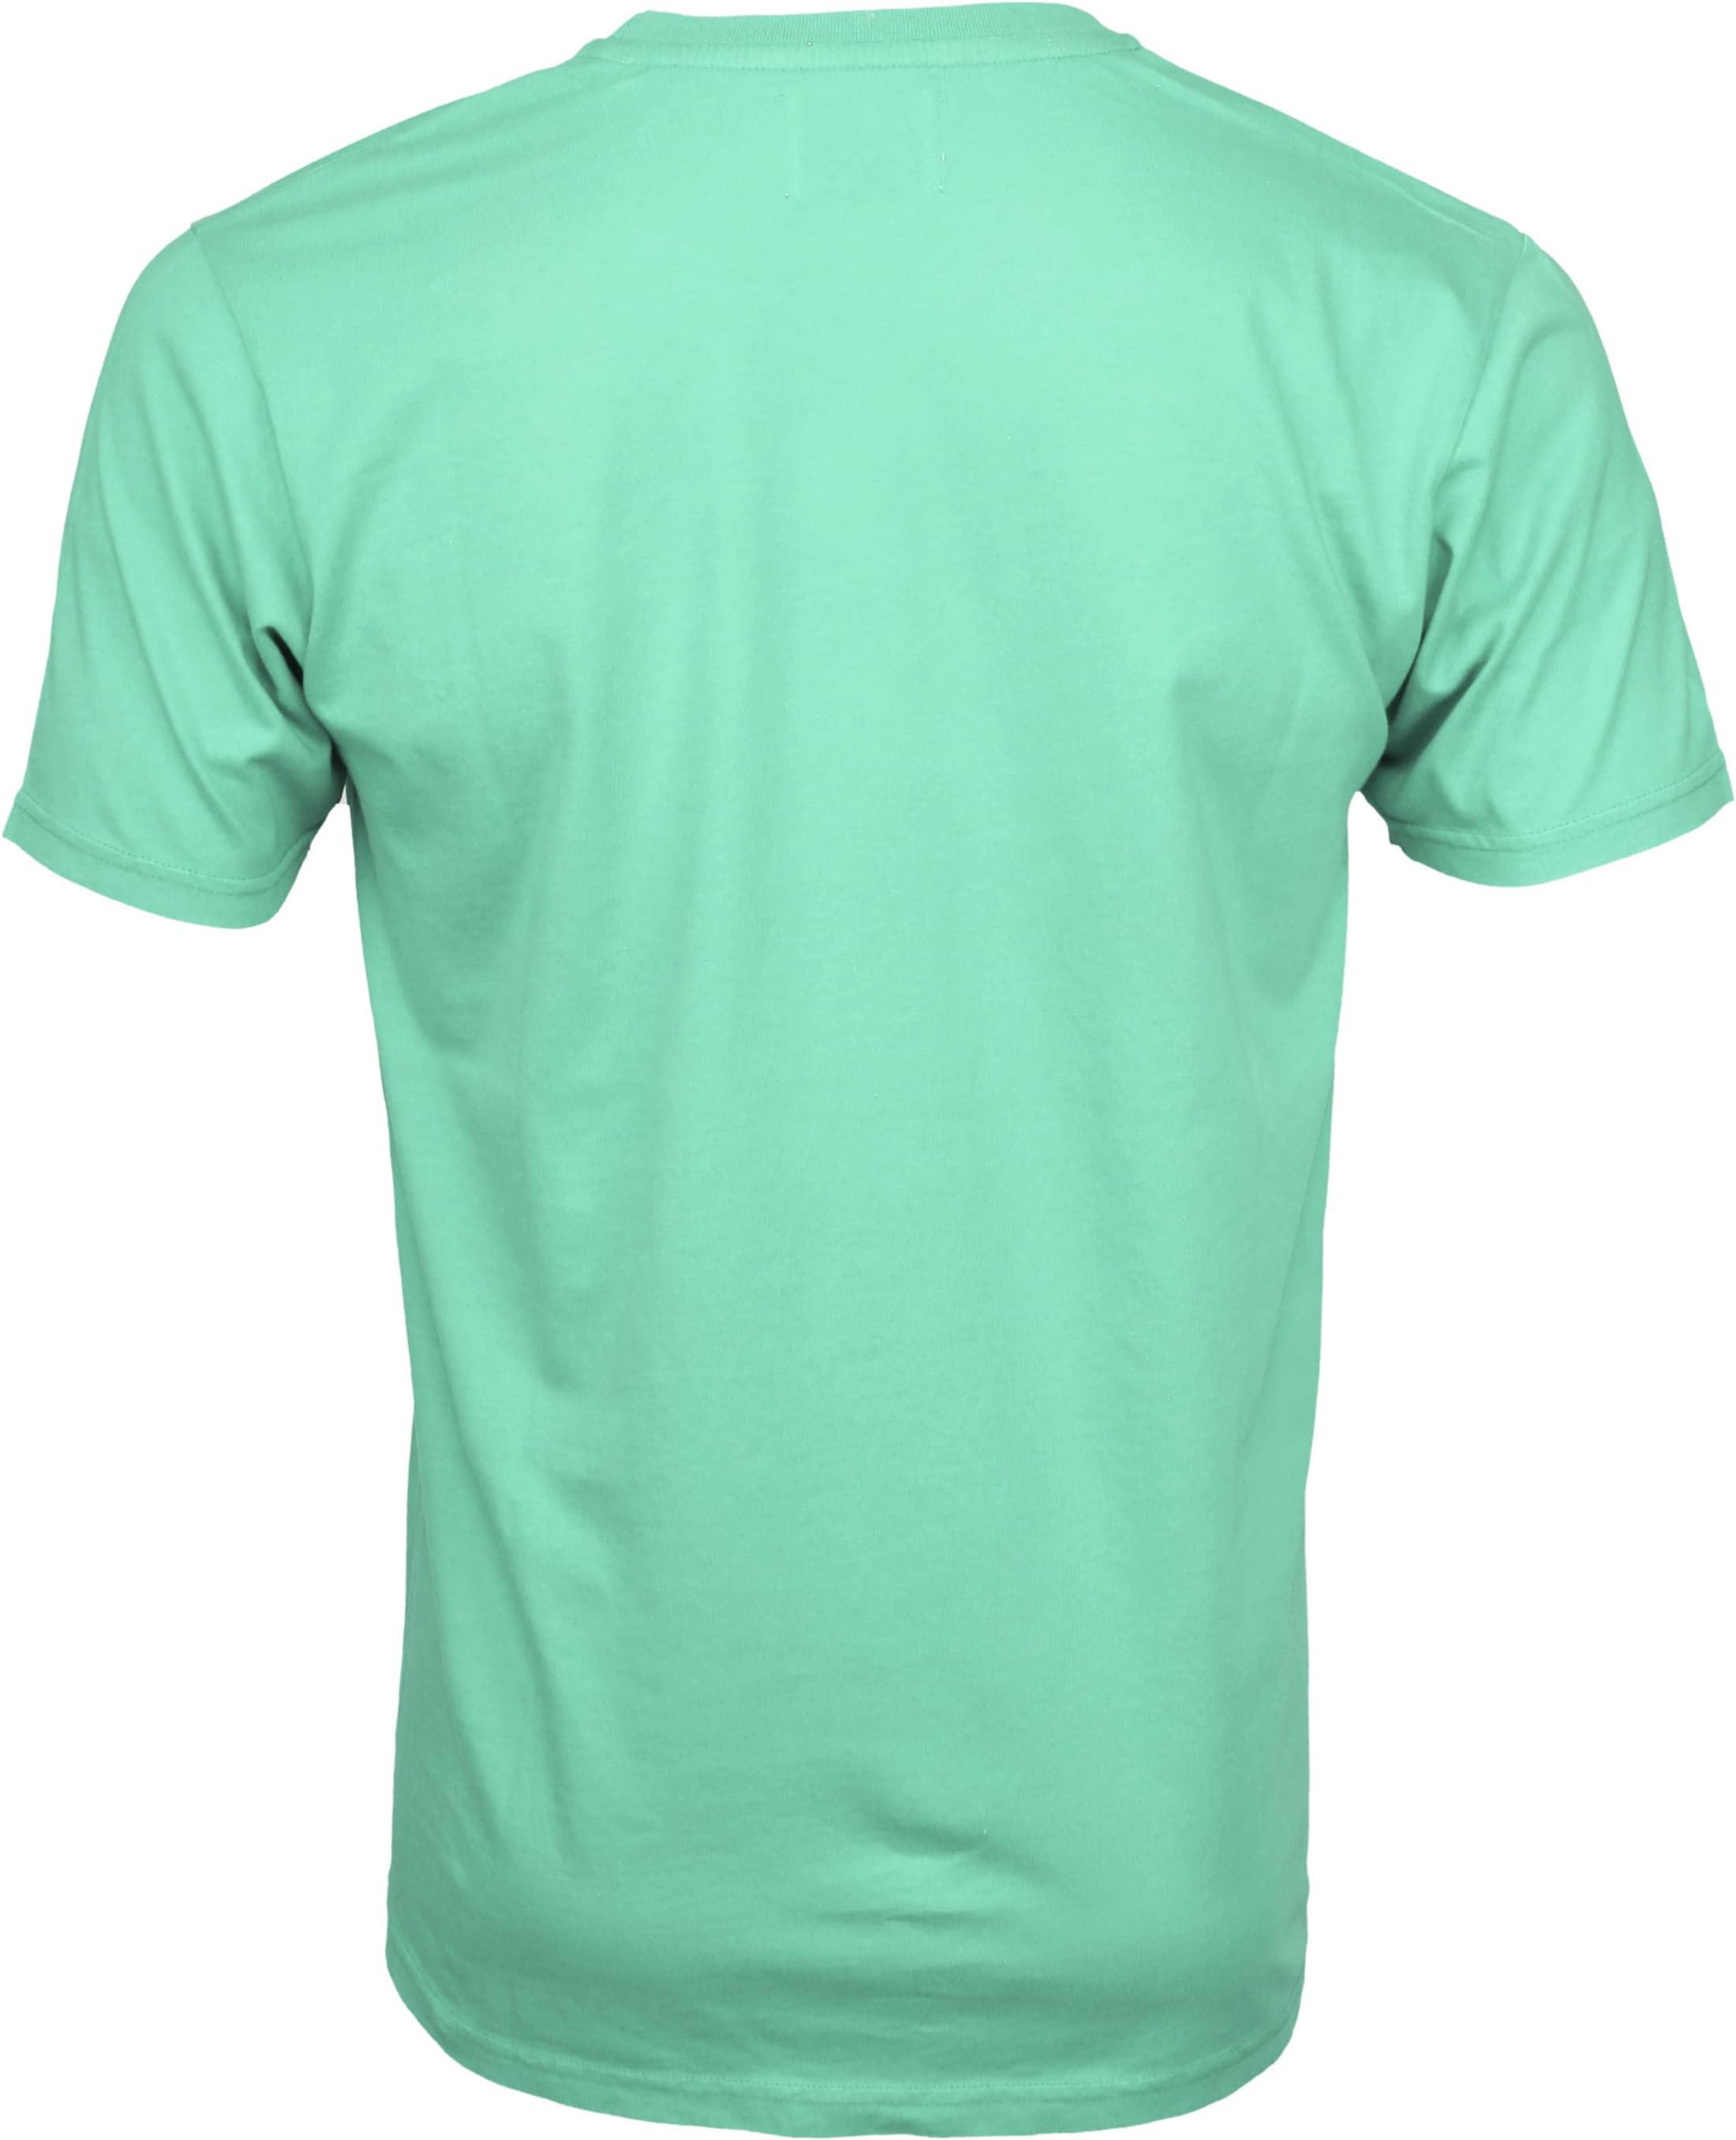 Colorful Standard T-shirt Faded Mint foto 2